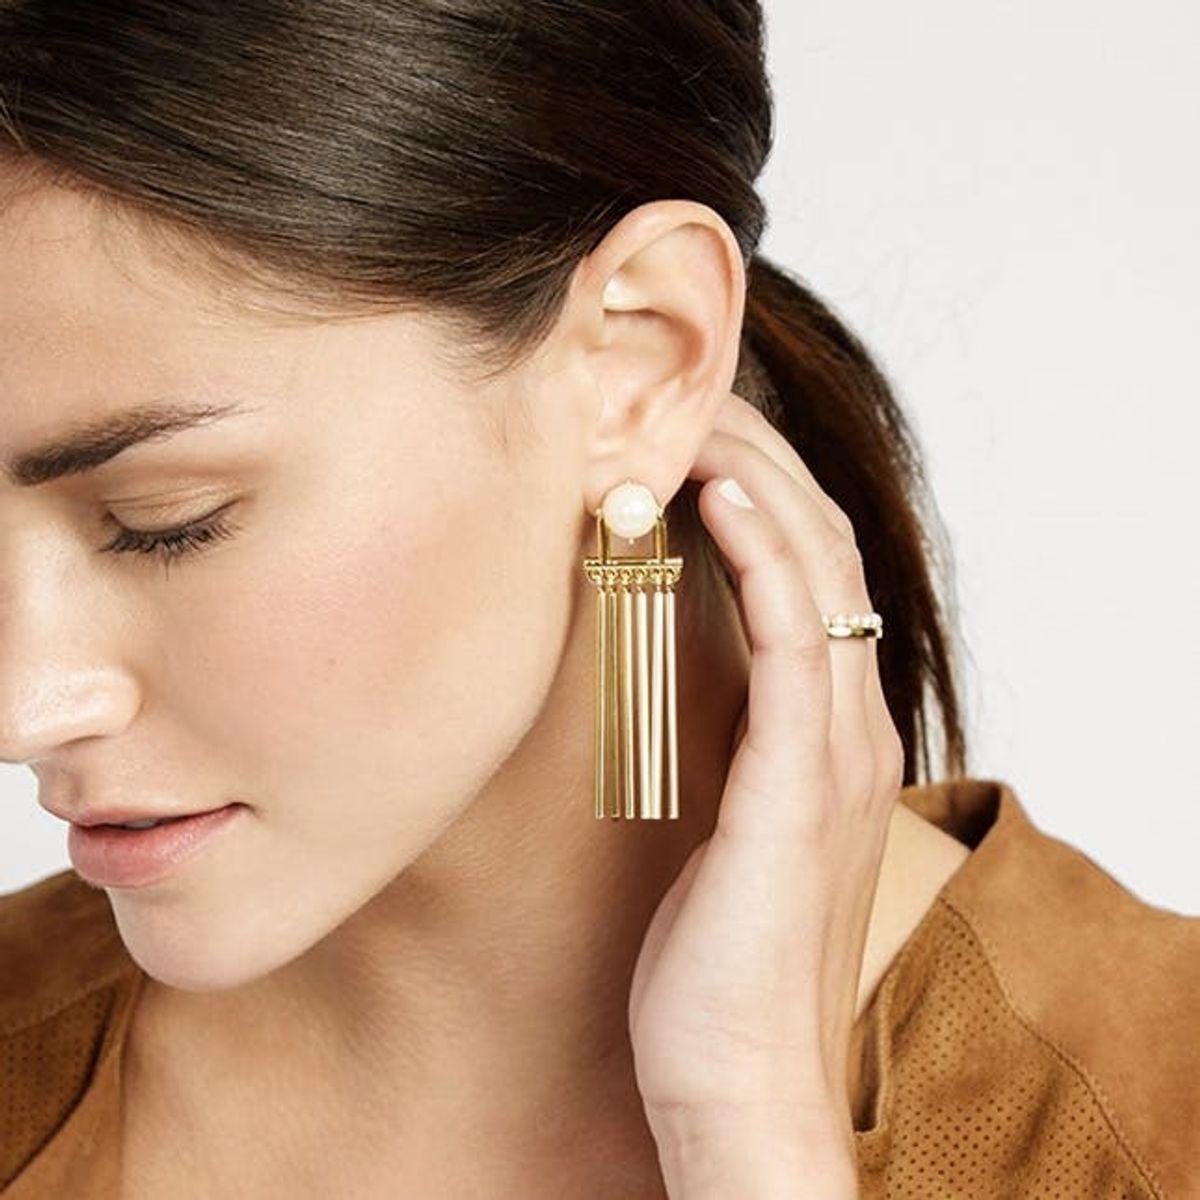 Schuette Statement Earrings A